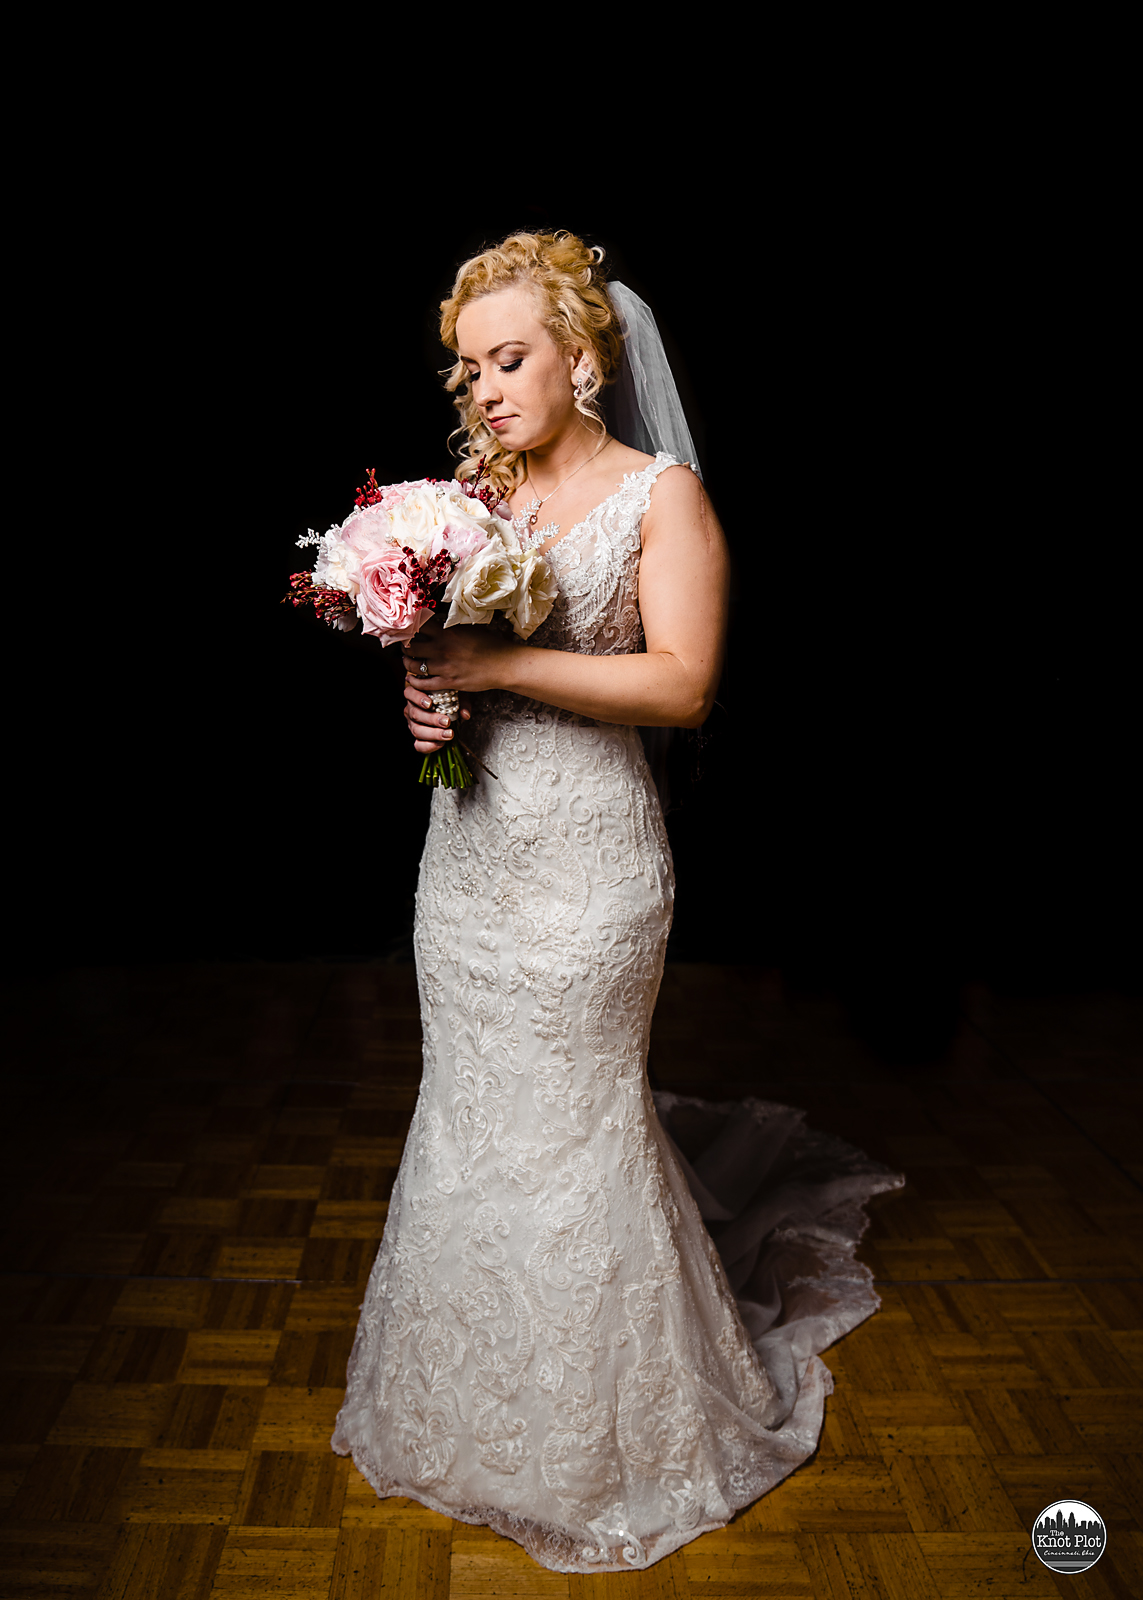 Embassy-Suites-Rivercenter-Cincinnati-Wedding-Photography-8.jpg